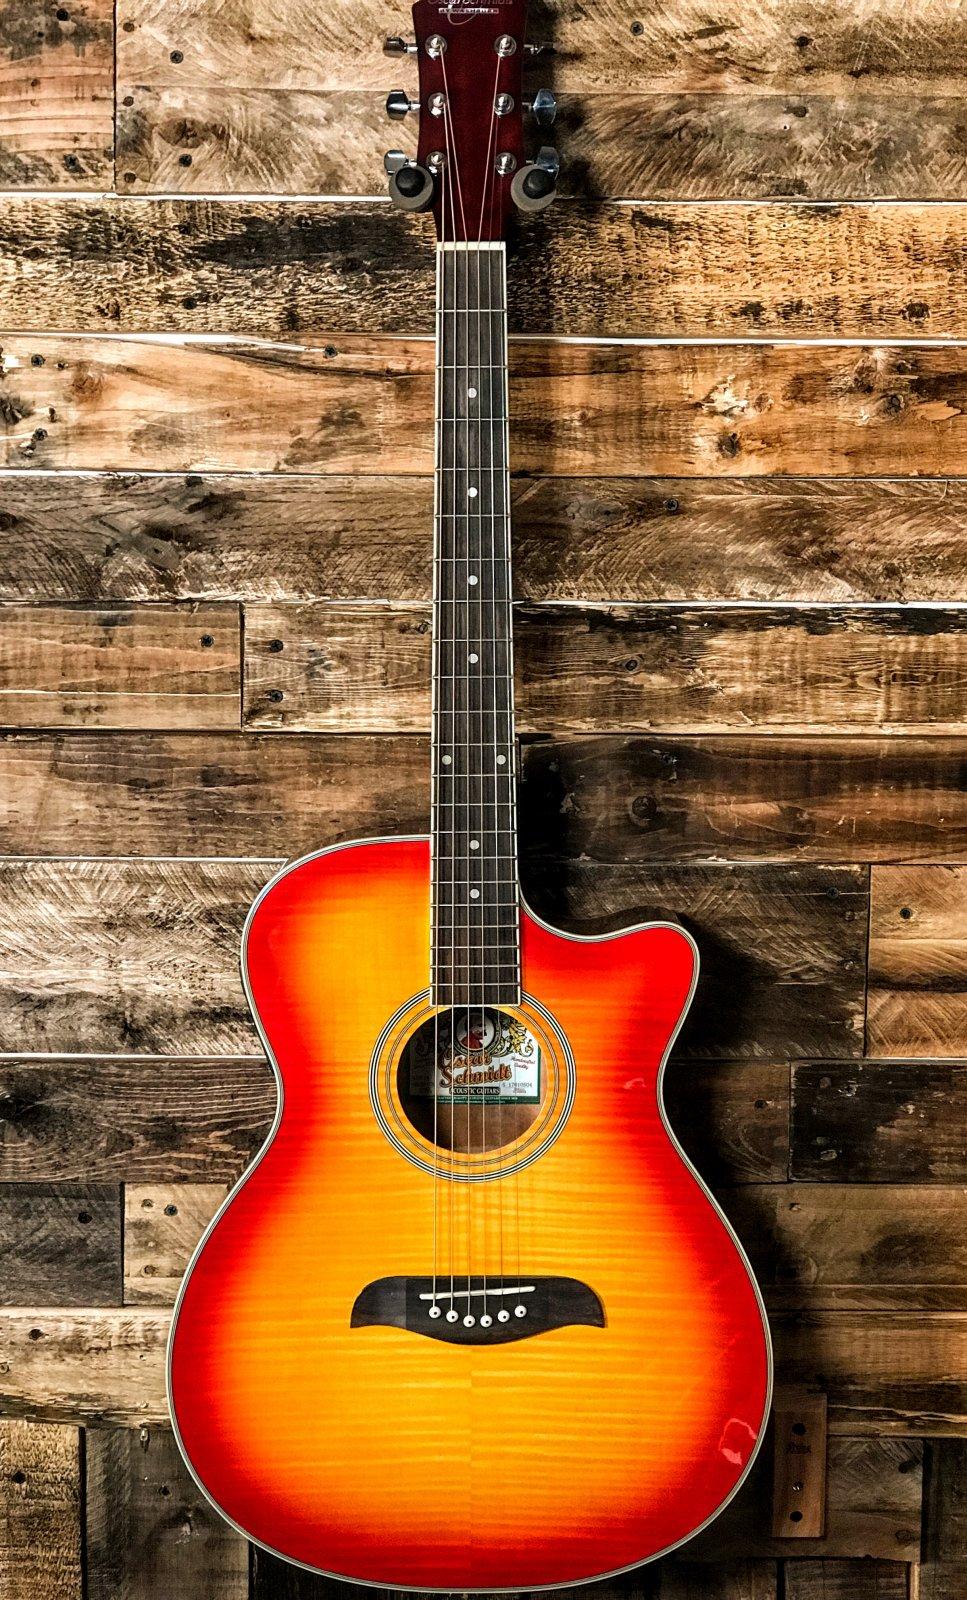 Oscar Schmidt OACEFCS Auditorium Acoustic Guitar